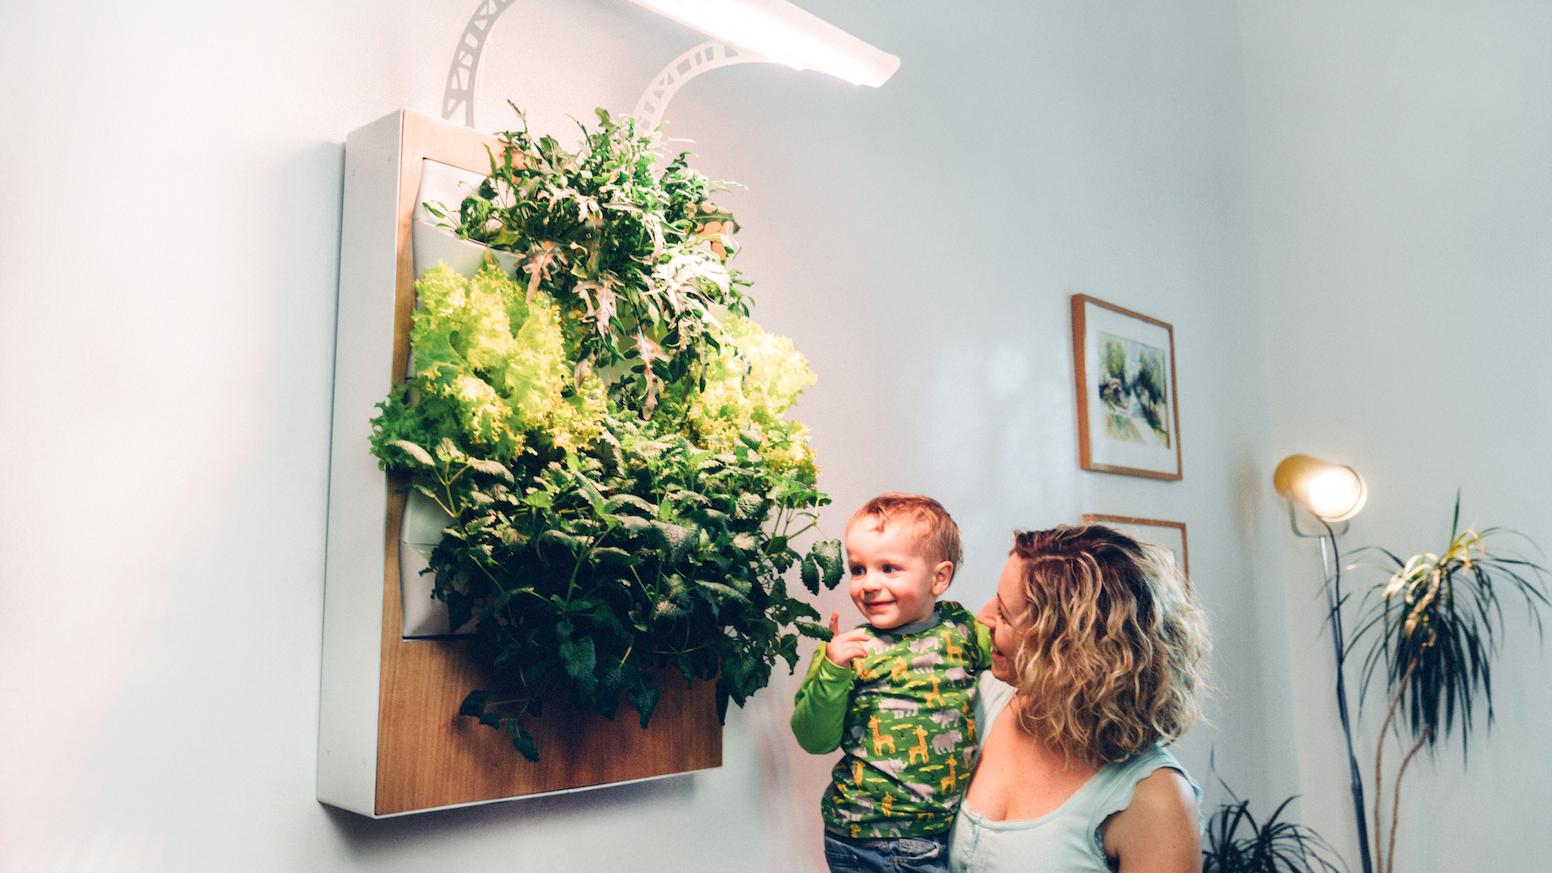 Herbert Grow Fresh Organic Food At Home